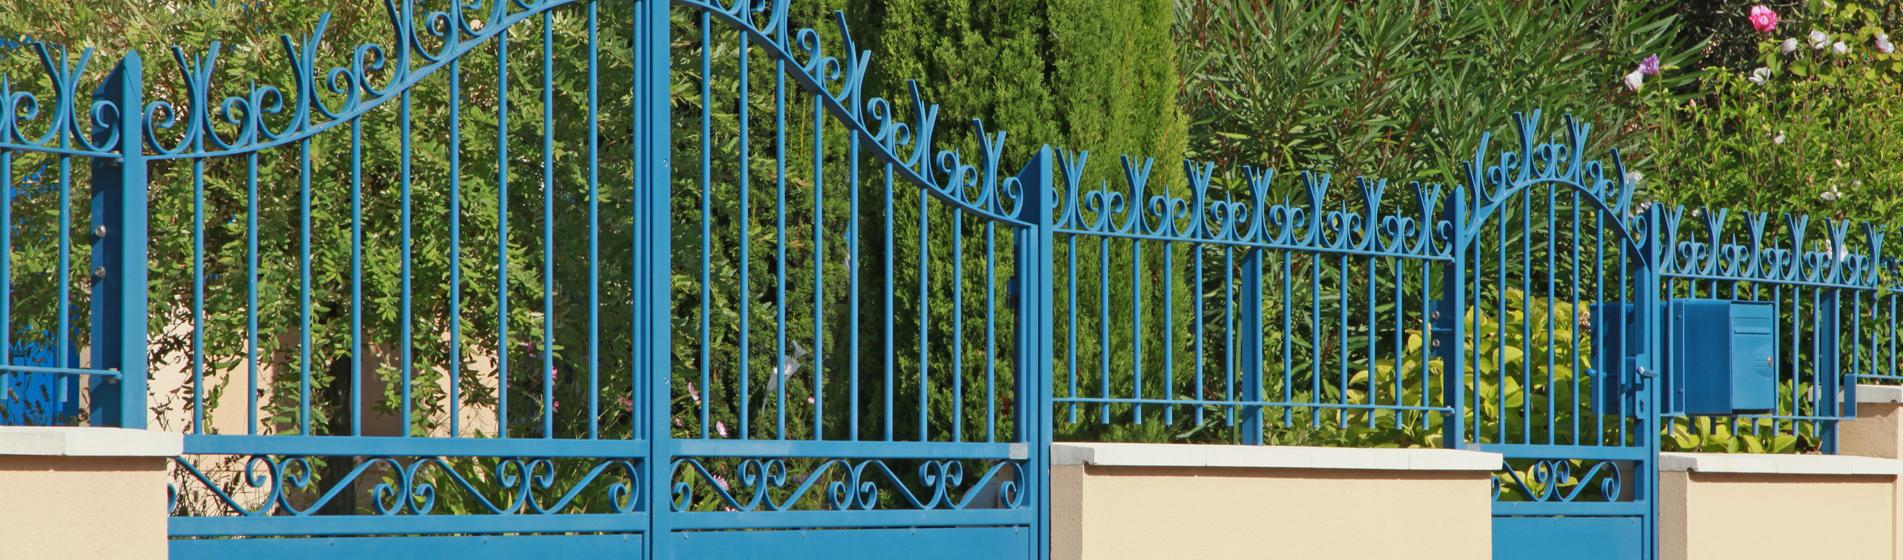 fabricant portail battant 84 Vaucluse